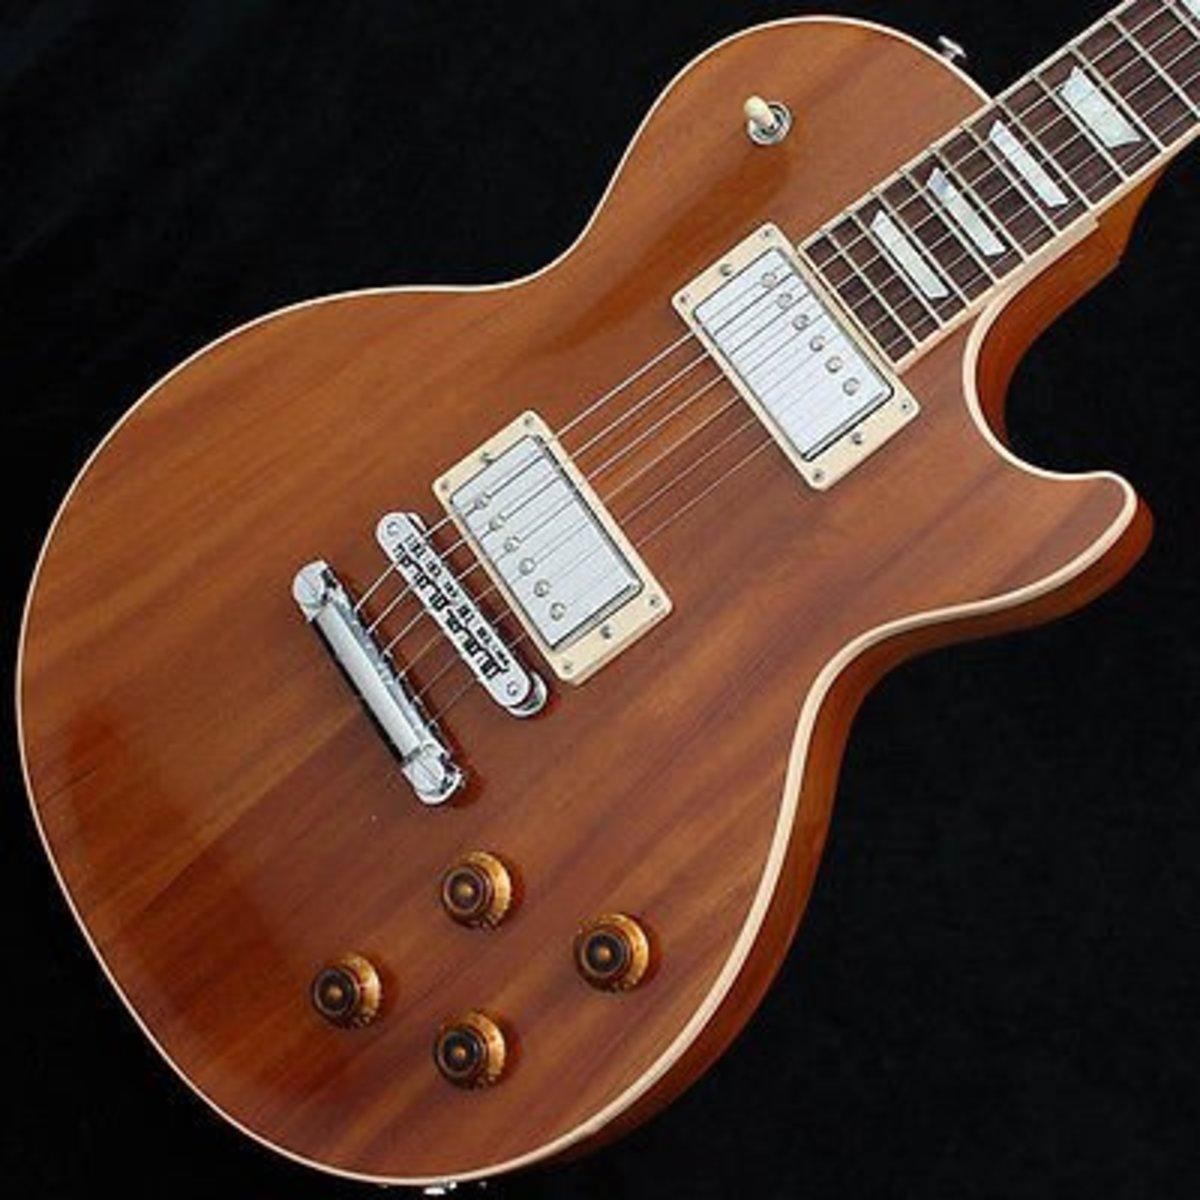 Gibson Les Paul Standard Mahogany Top